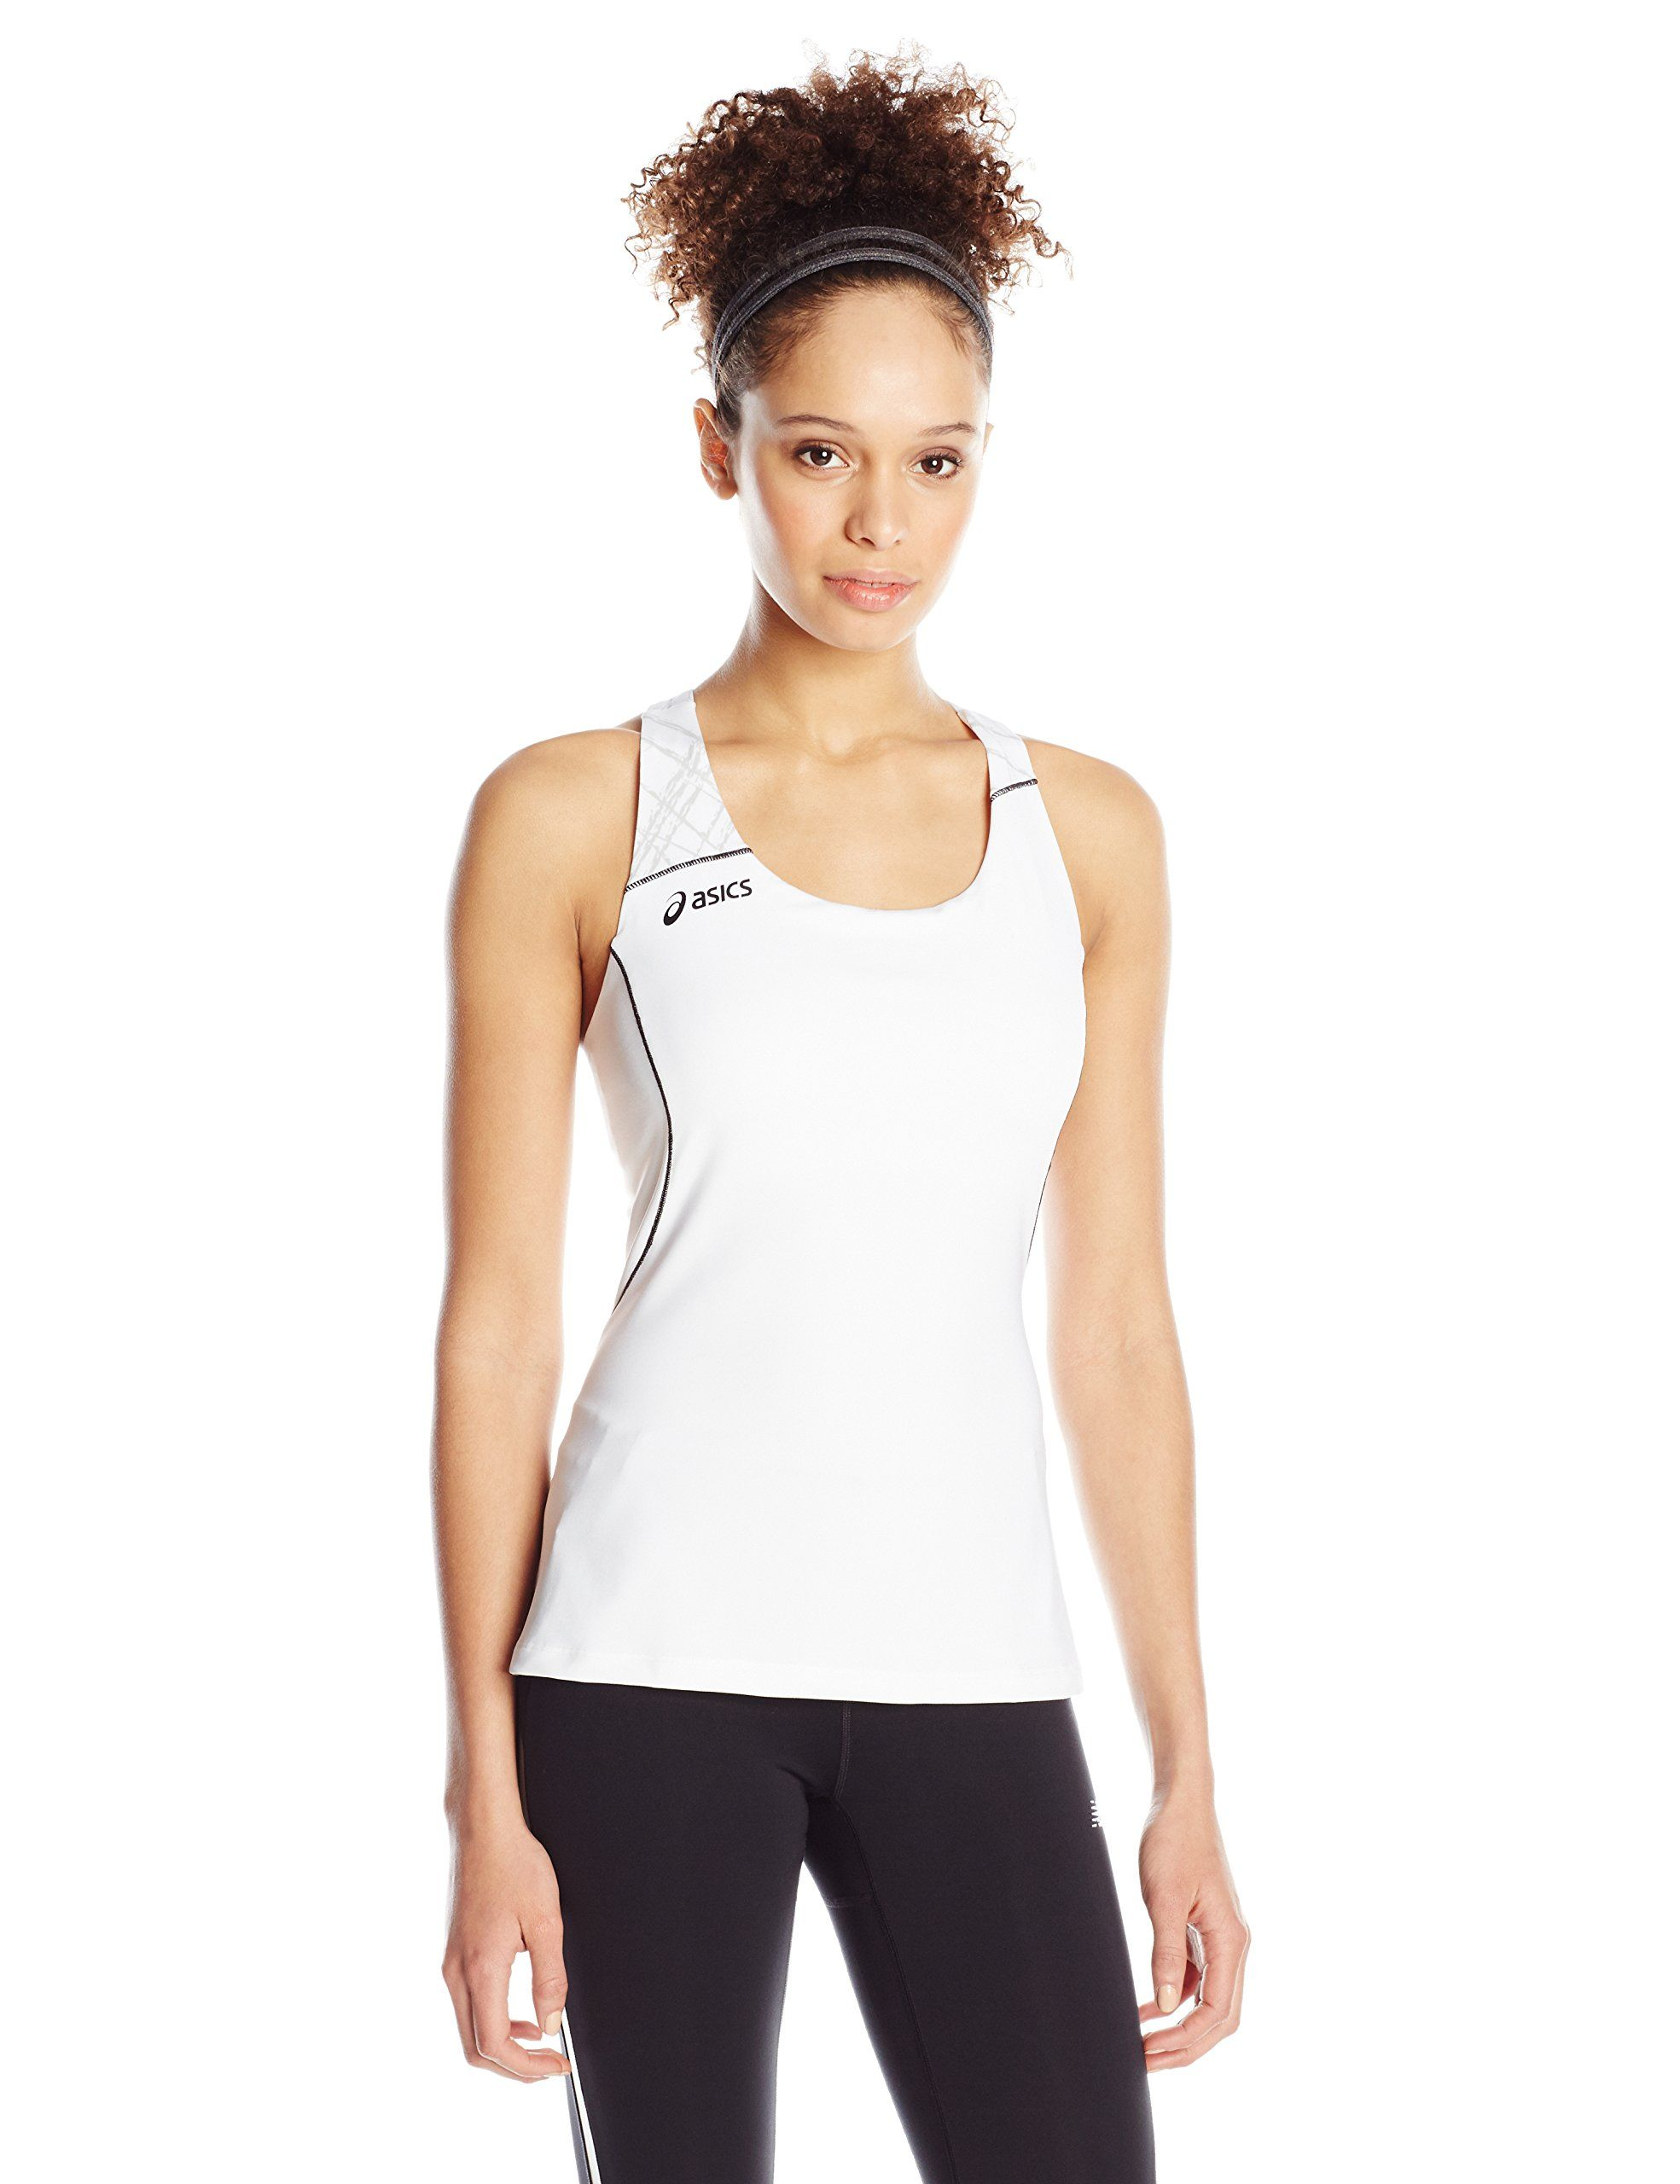 285e1b7f8fbcdb Skirt Sports Women s Vixen Tank Shirt Black Shadow Heather Medium Womens  Athleti